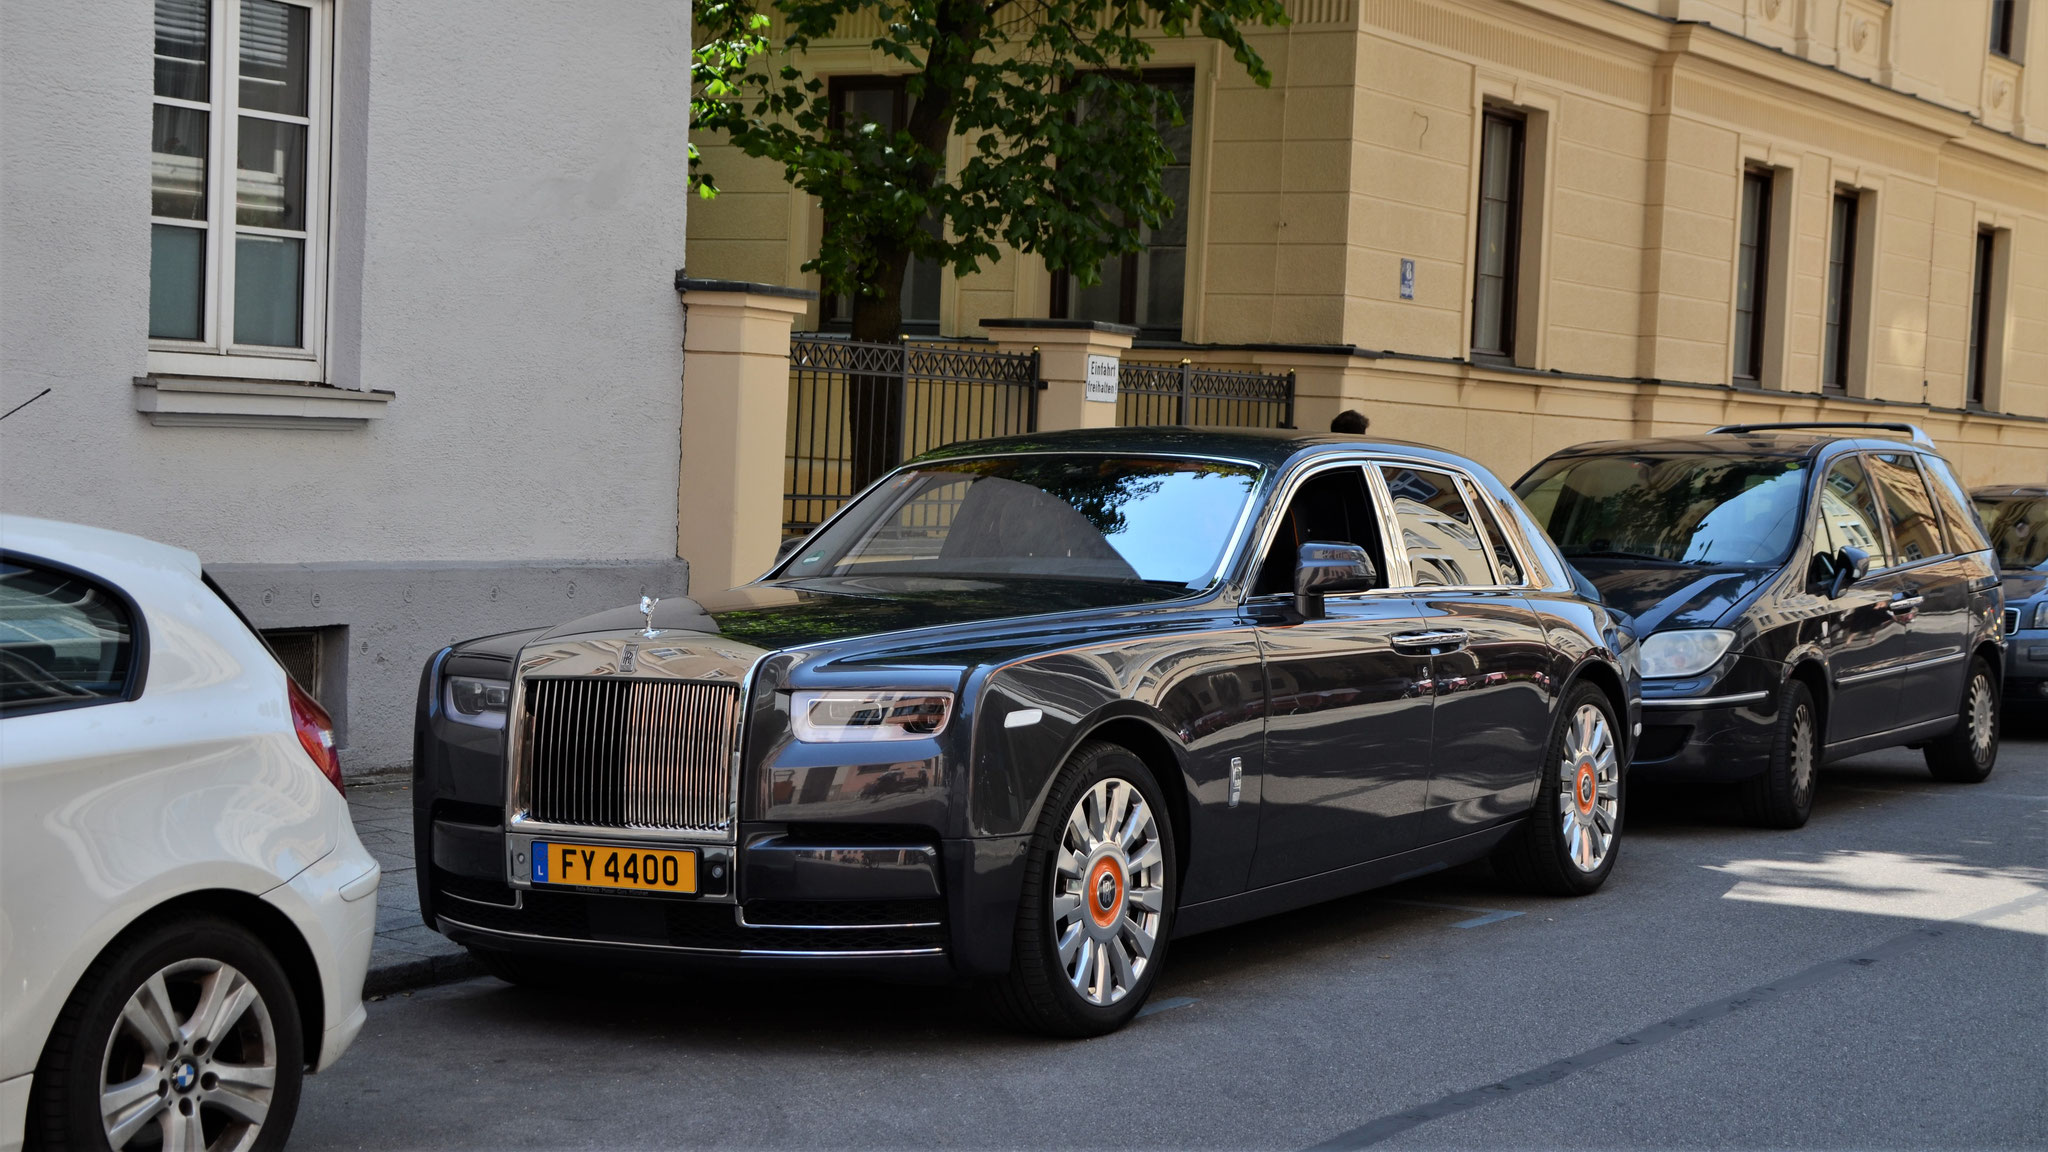 Rolls Royce Phantom - FY-4400 (LUX)